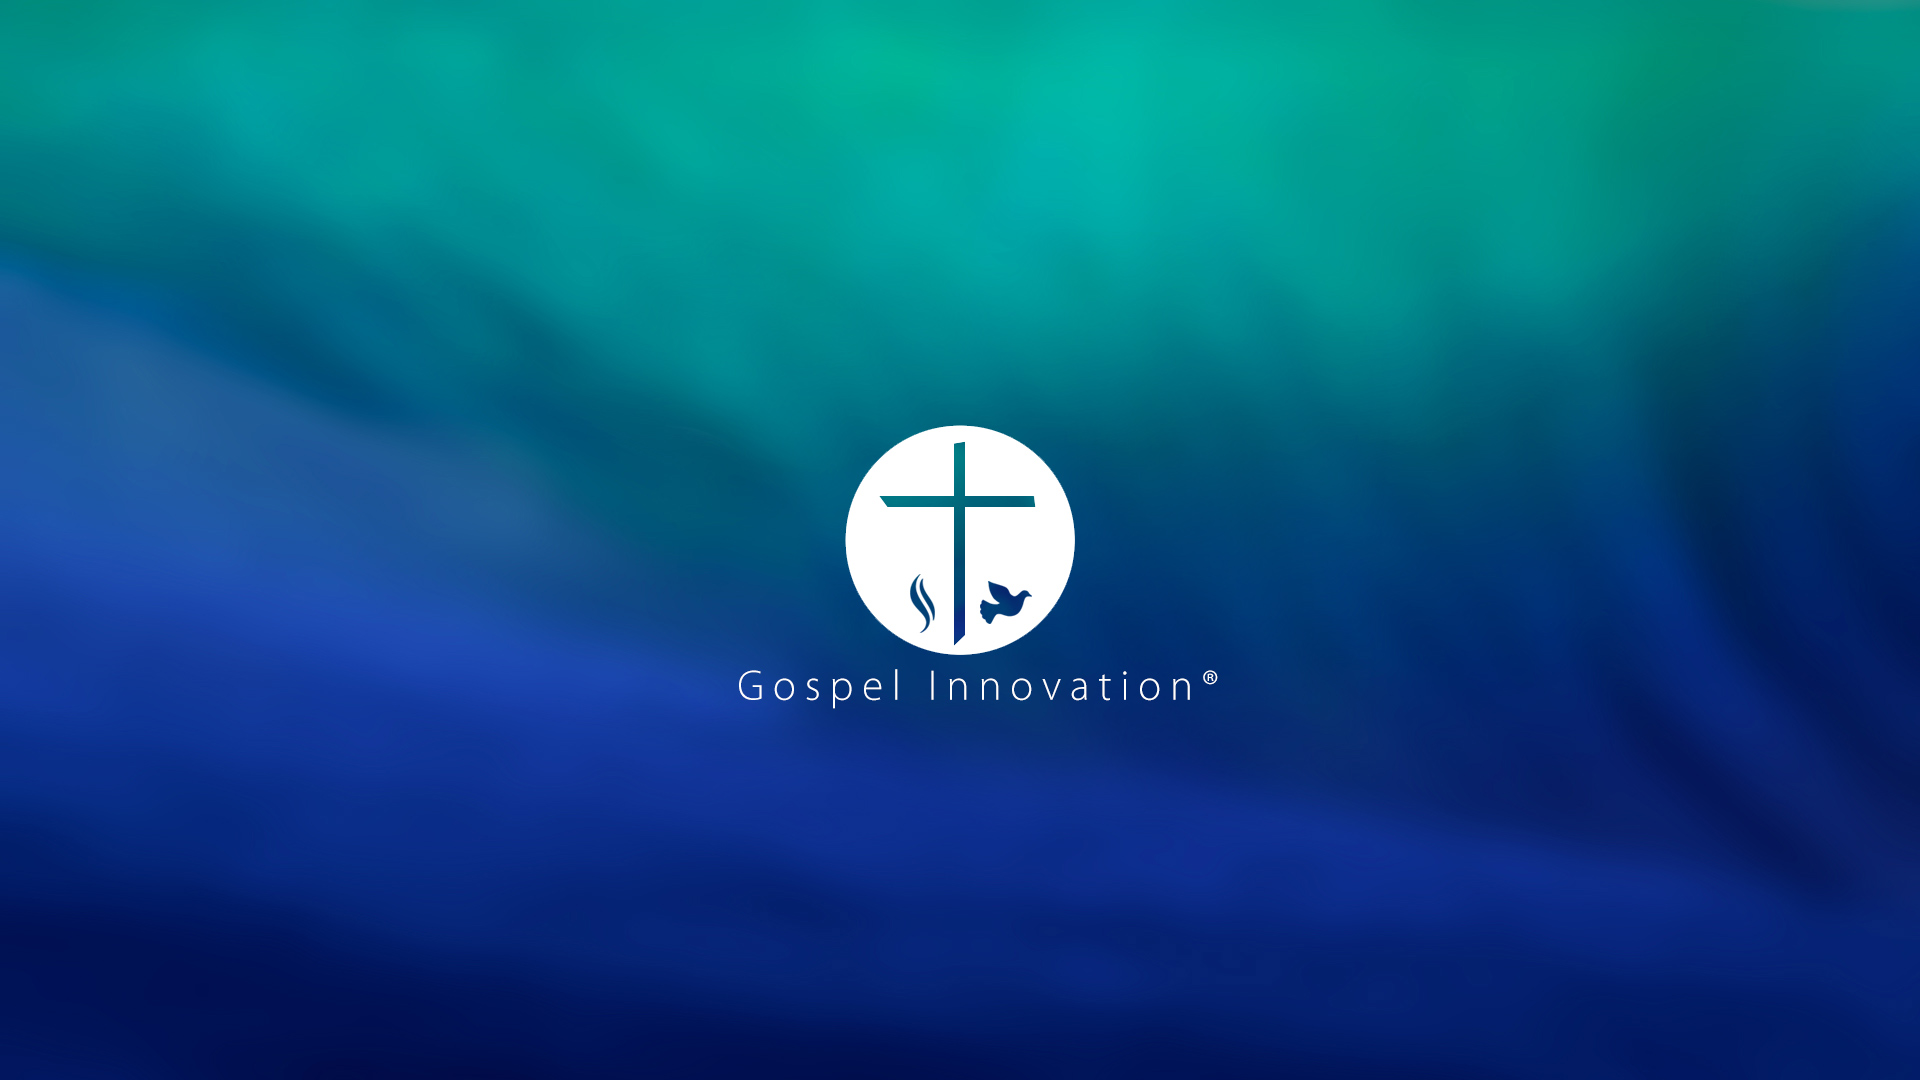 gospel music wallpaper 1280x800 - photo #18